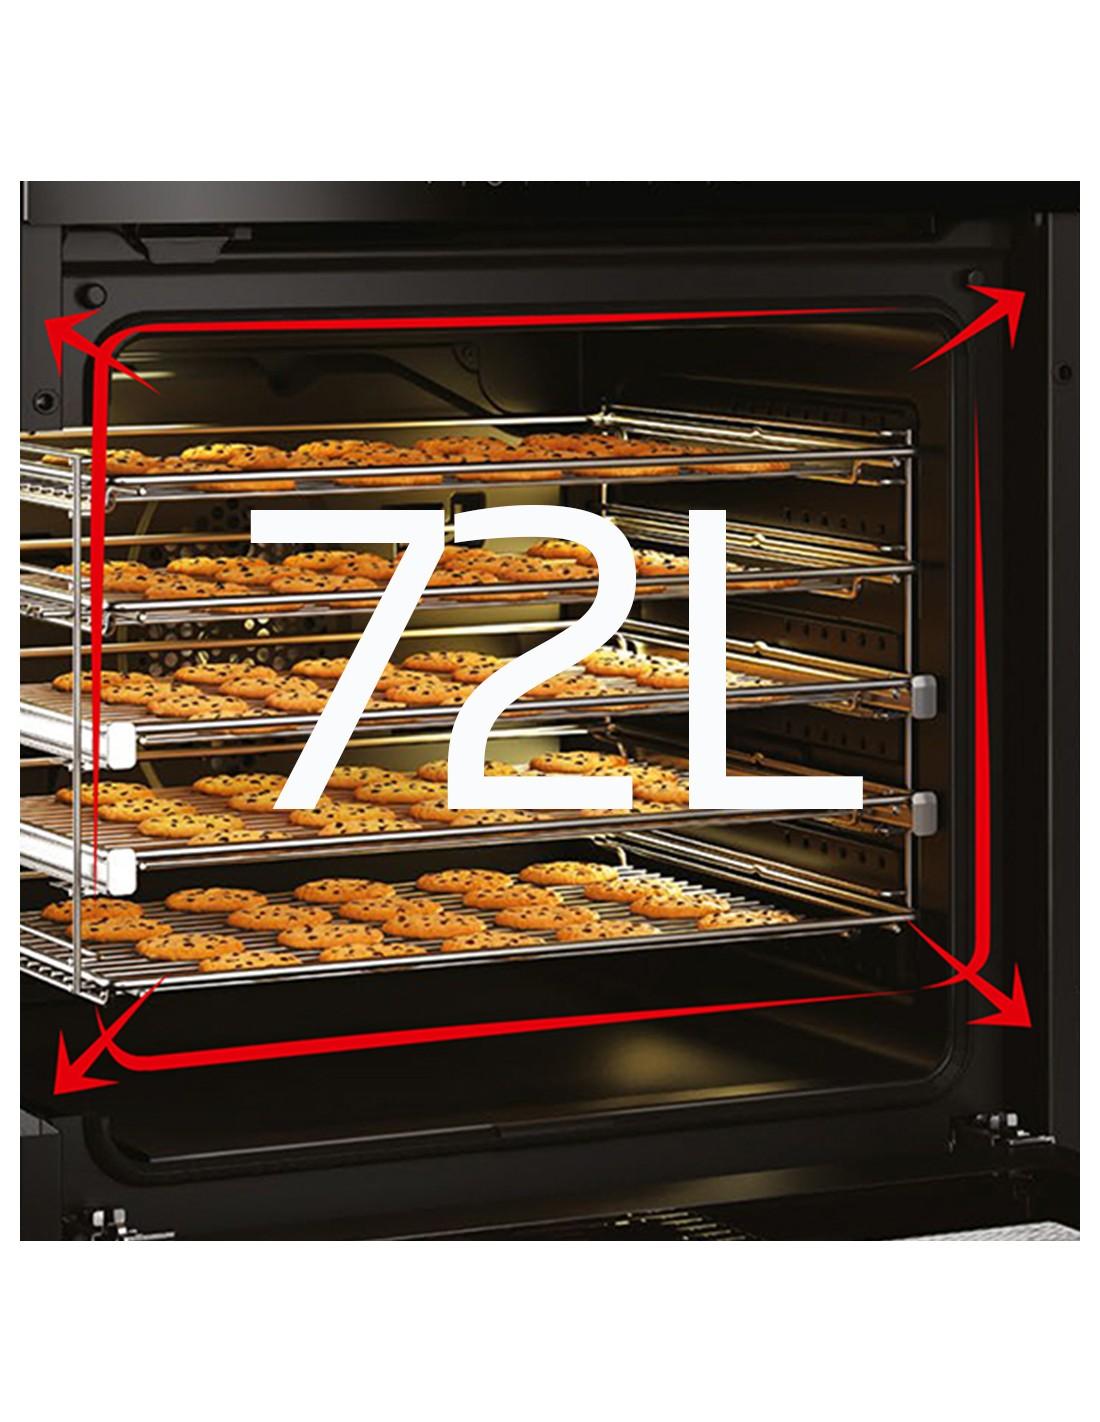 réfrigérateur combiné beko 450(l)sylver rcne520e21ds - promo-electro